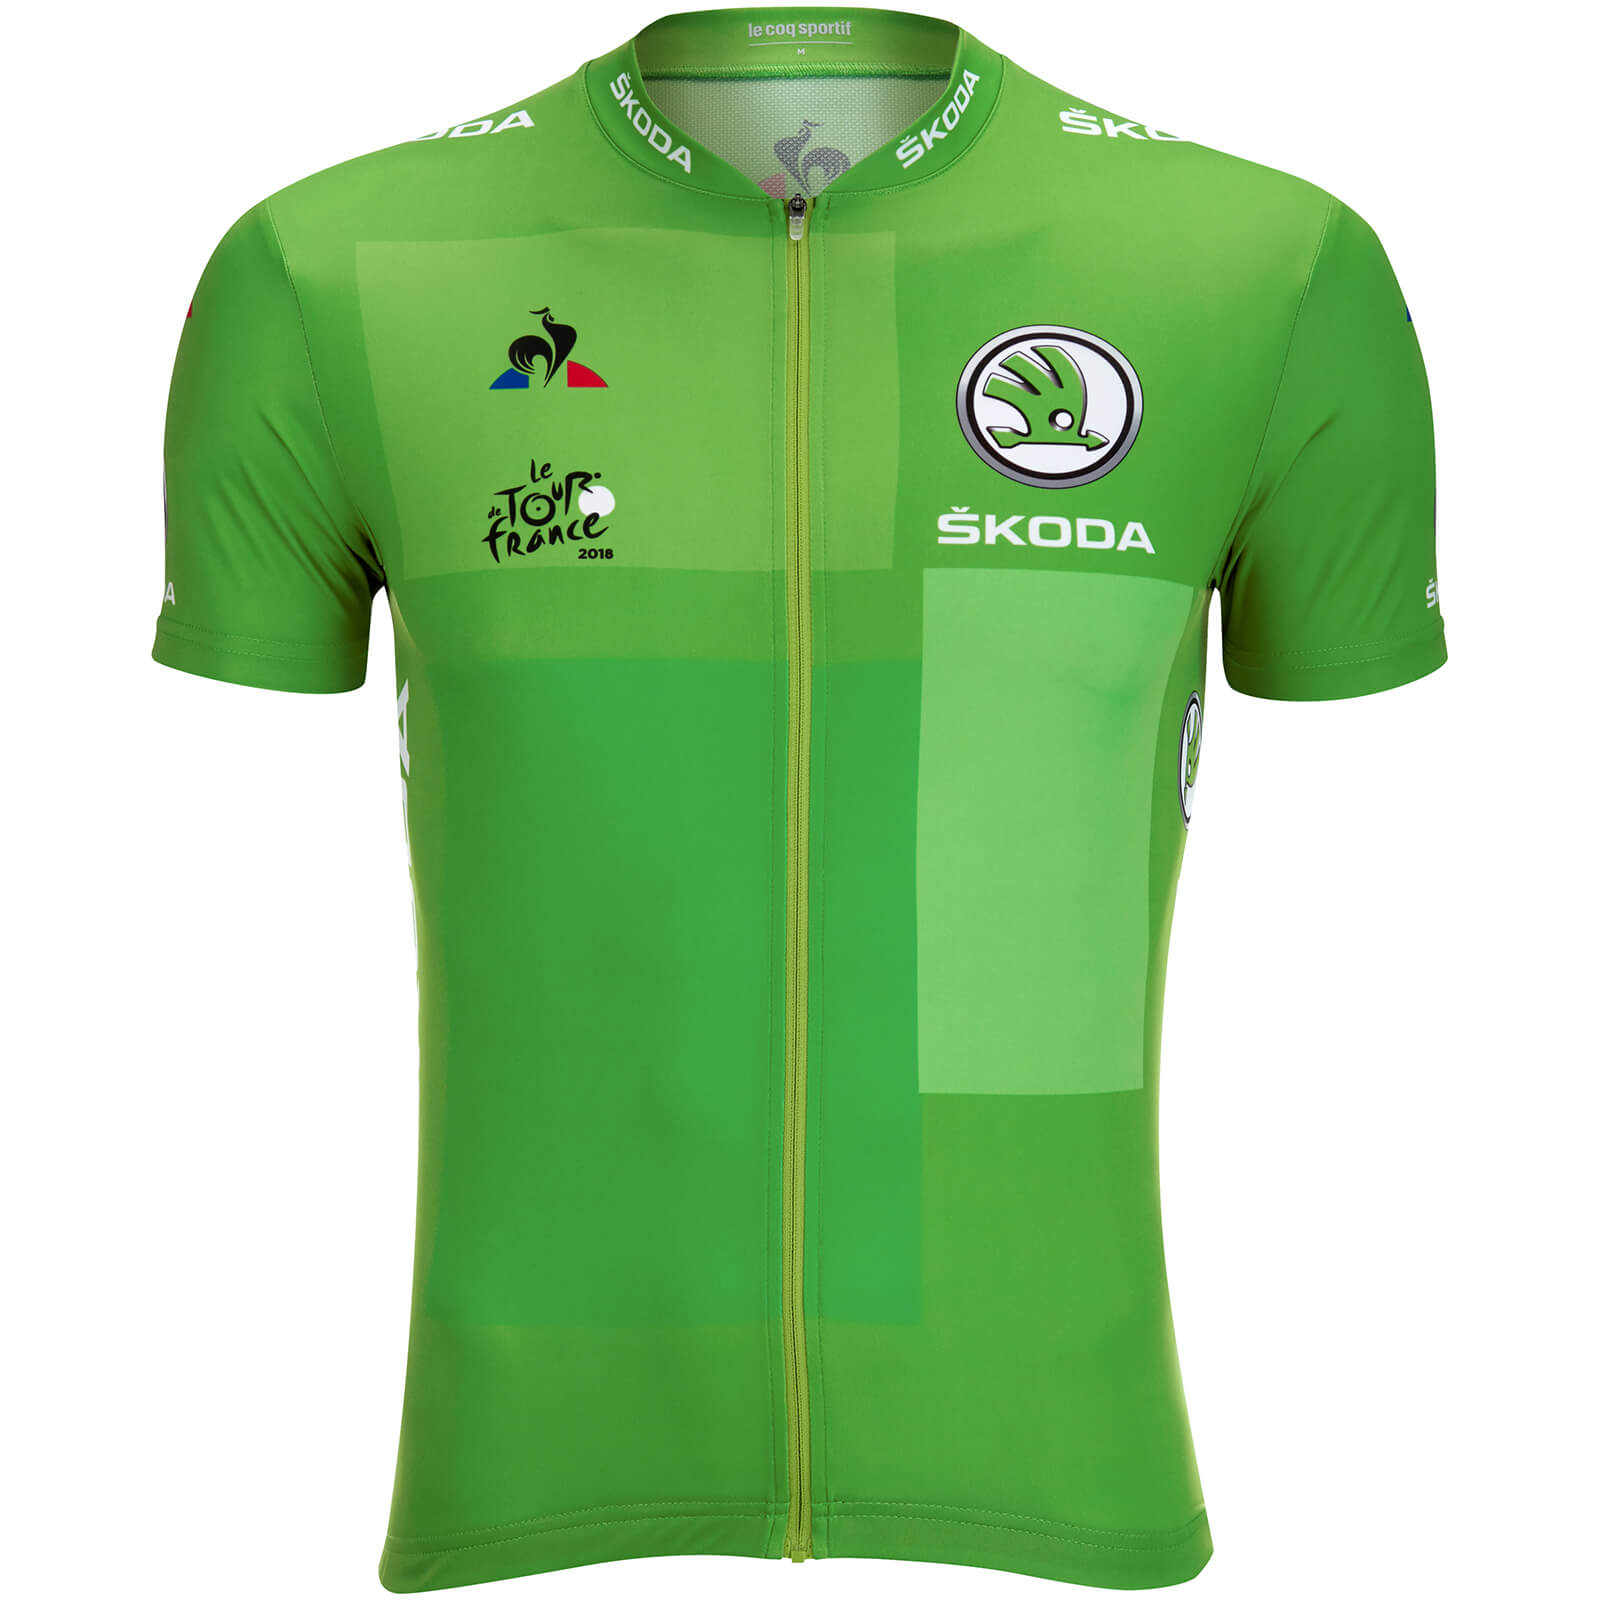 reputable site c12bf 6fd98 Le Coq Sportif Tour de France 2018 Sprinters Official Jersey - Green